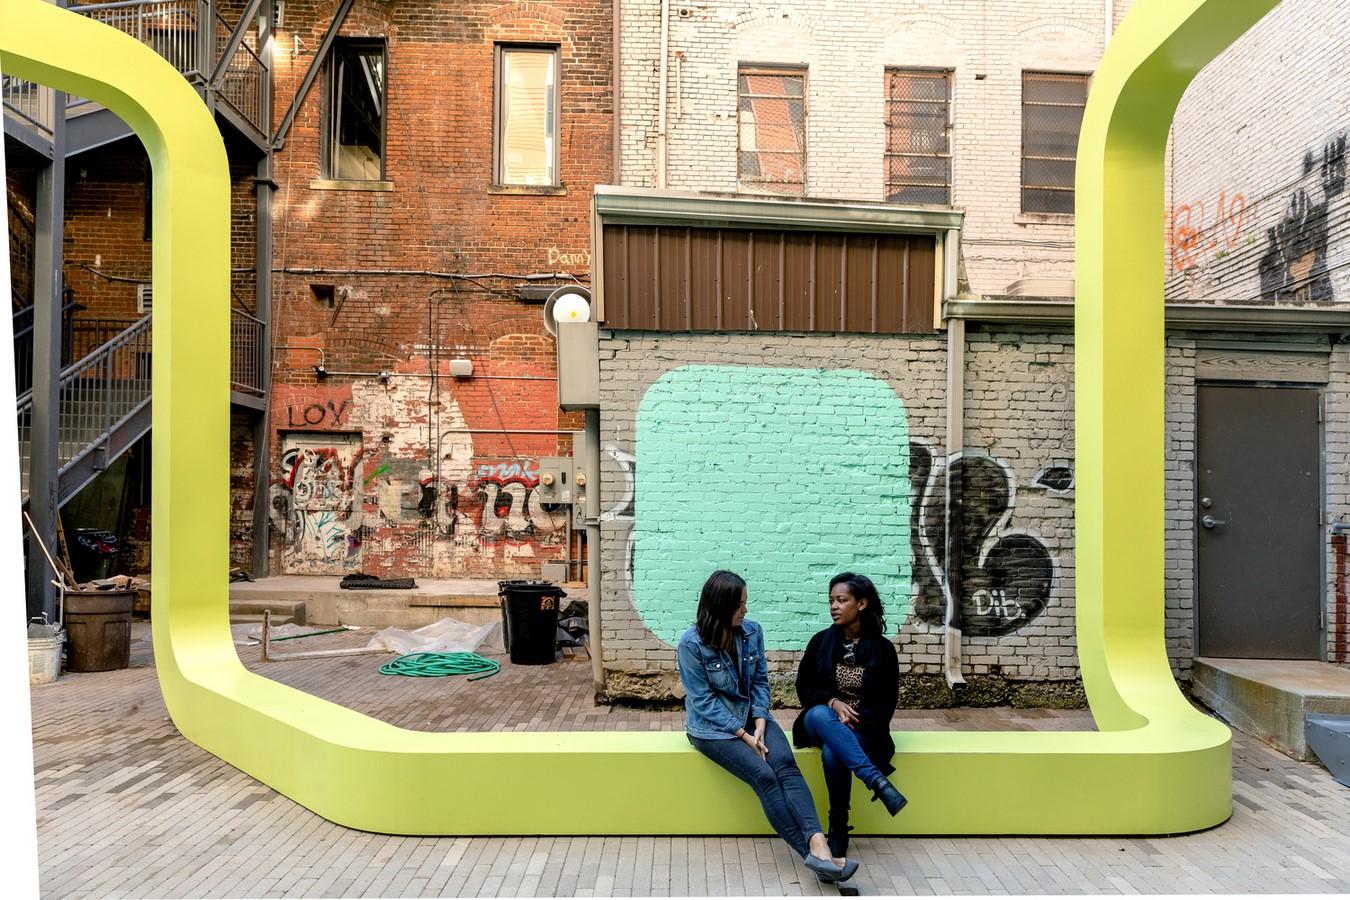 Urban regeneration through public space - Sheet8